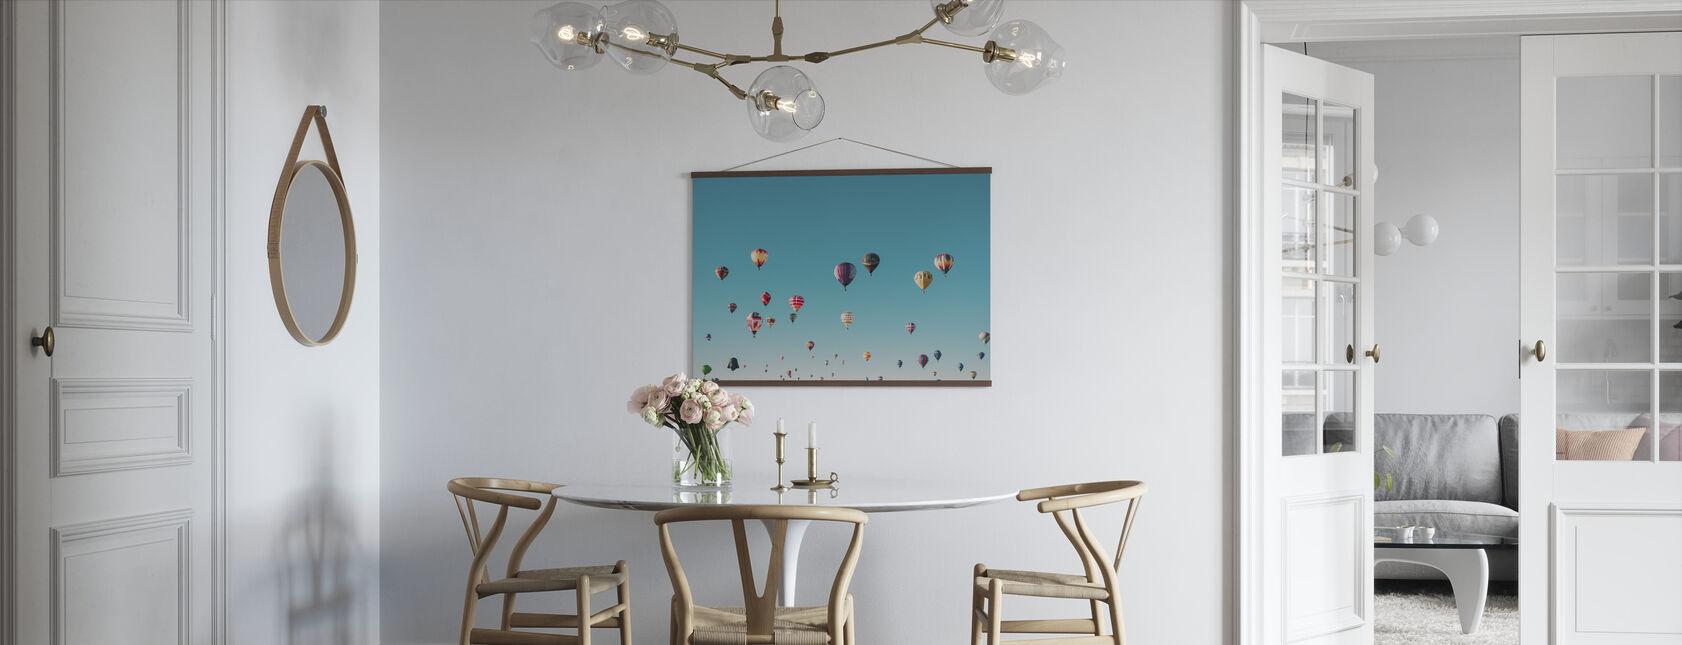 Hot Air Balloons - Poster - Kitchen